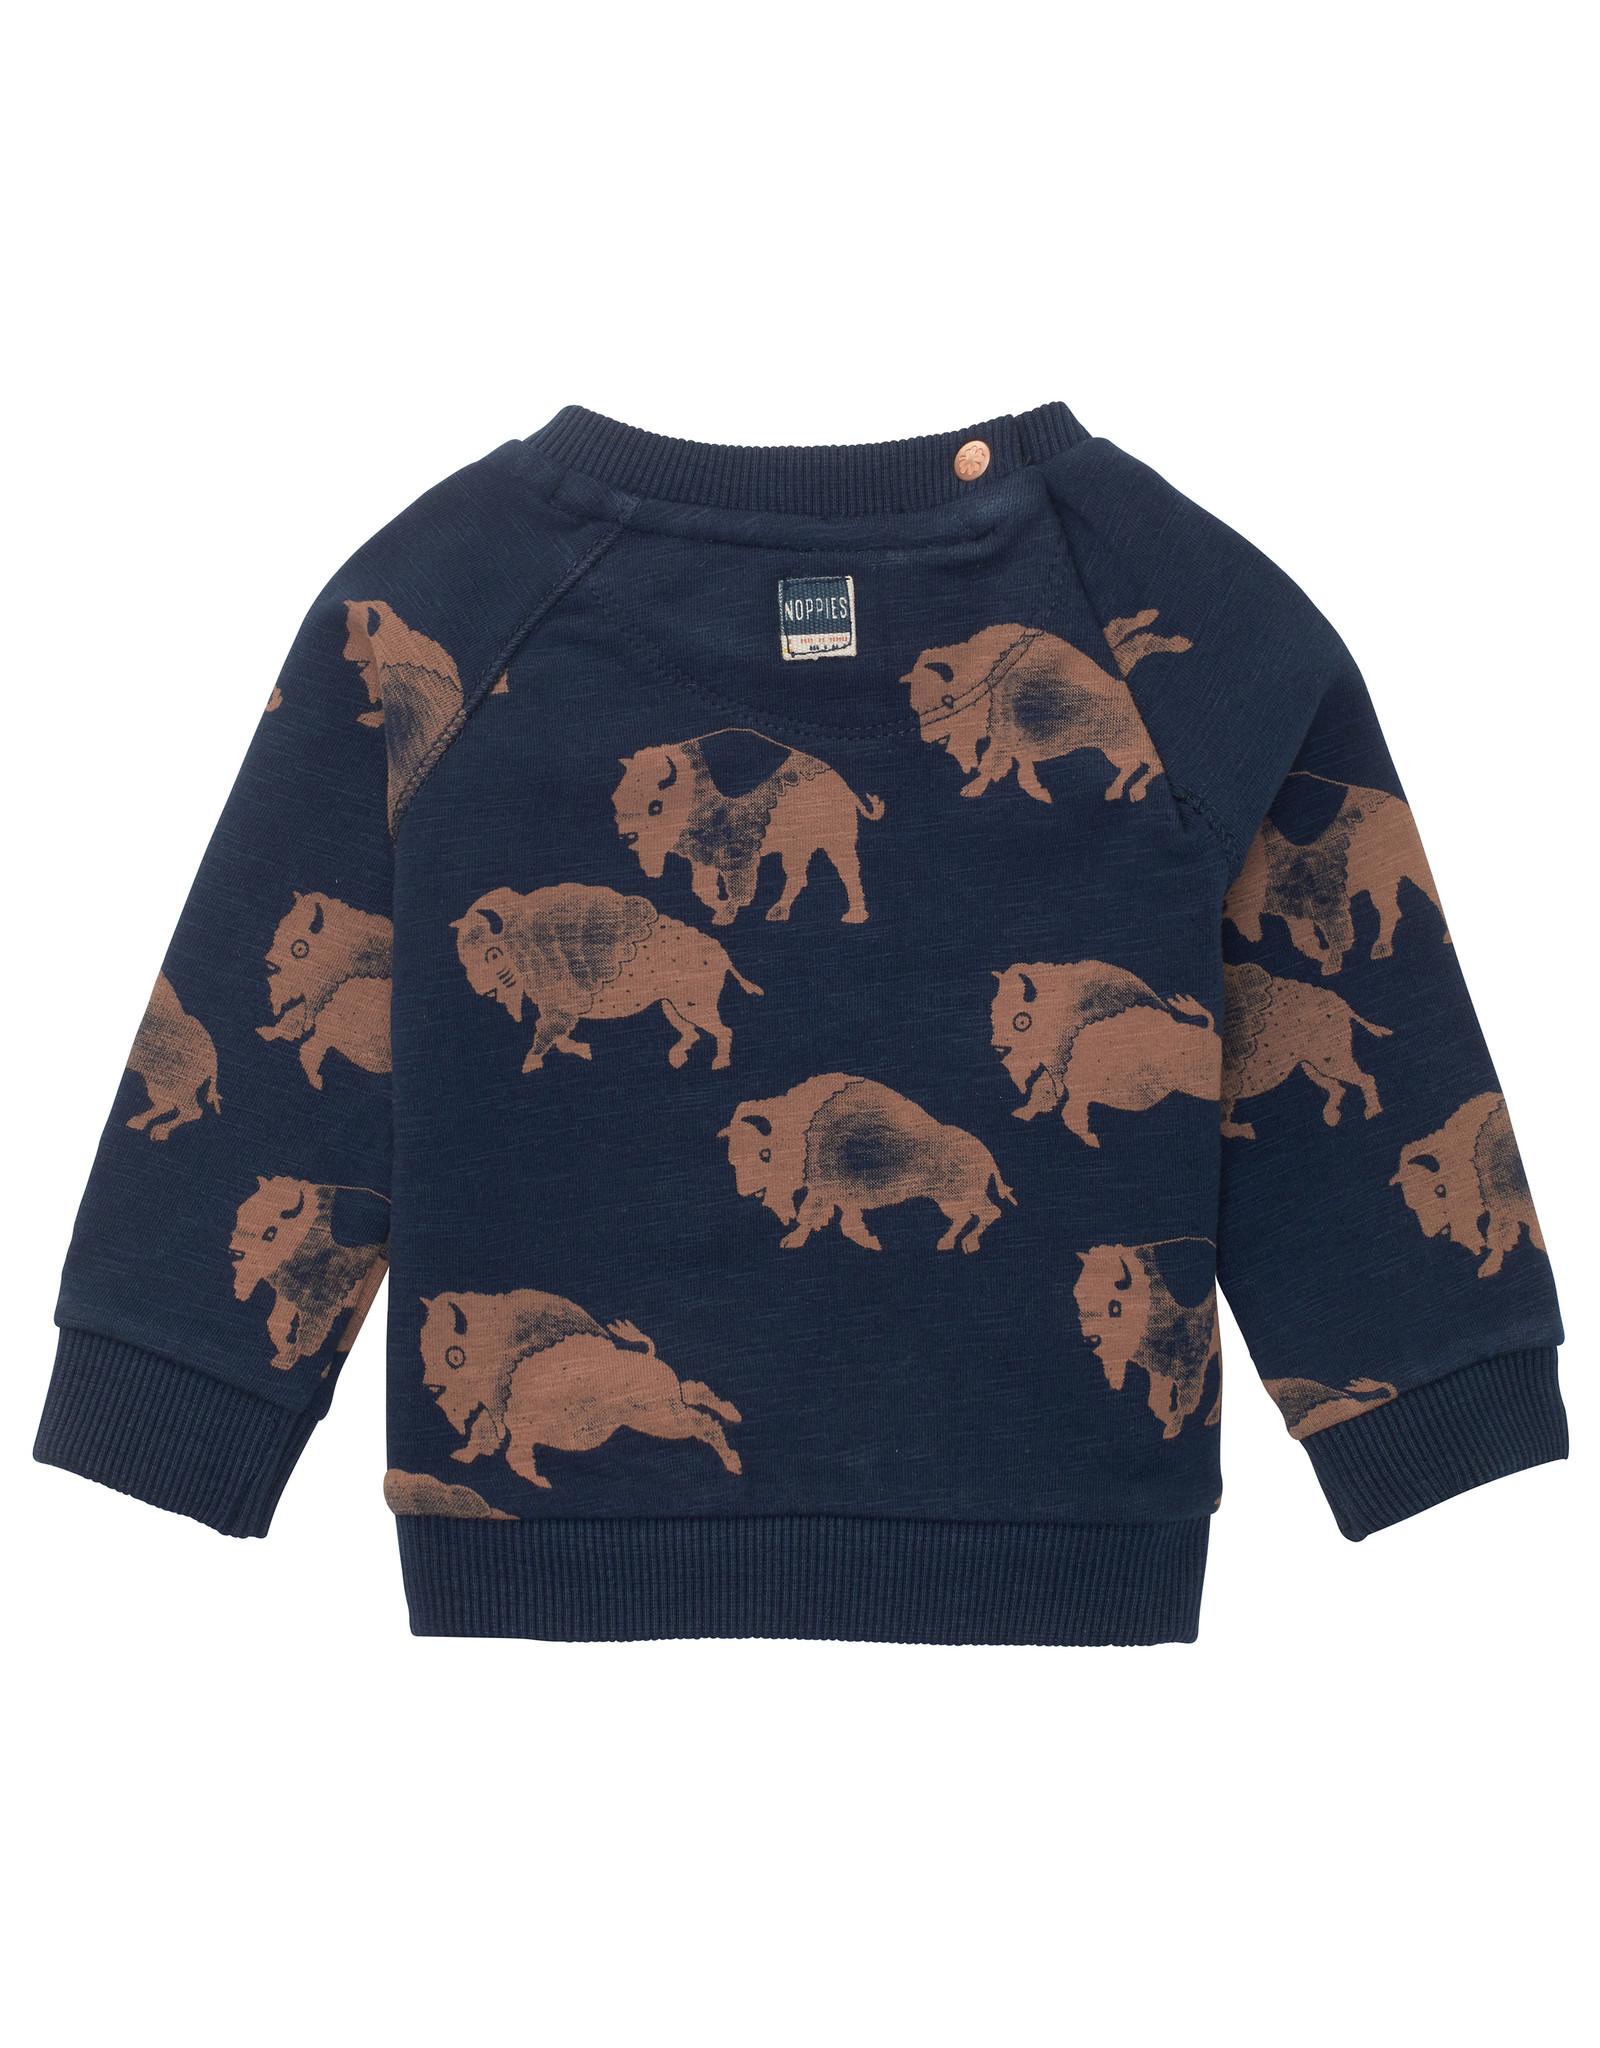 Noppies B Sweater LS Roanoke* Black Iris